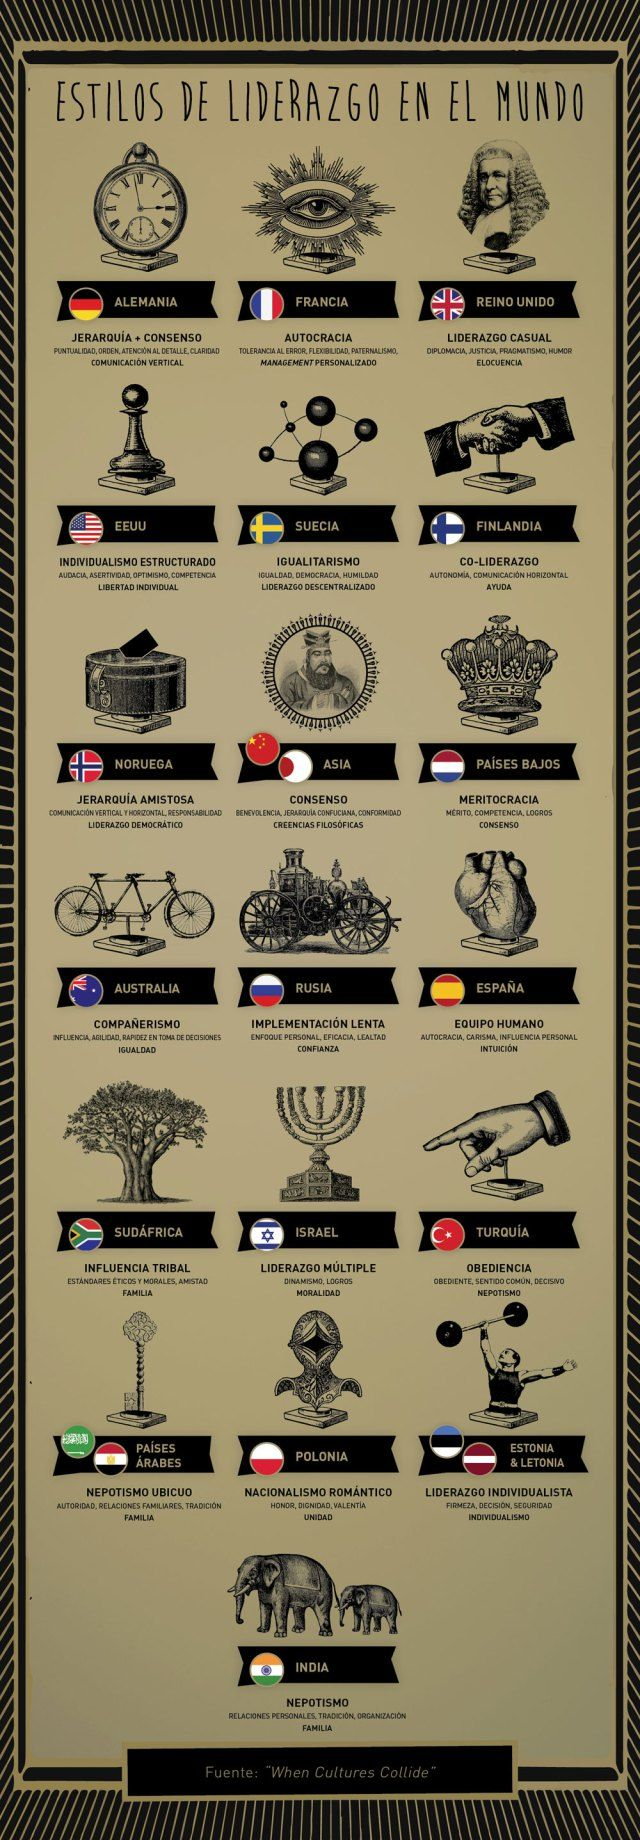 20 estilos de liderazgo en el mundo. #infografia #infographic